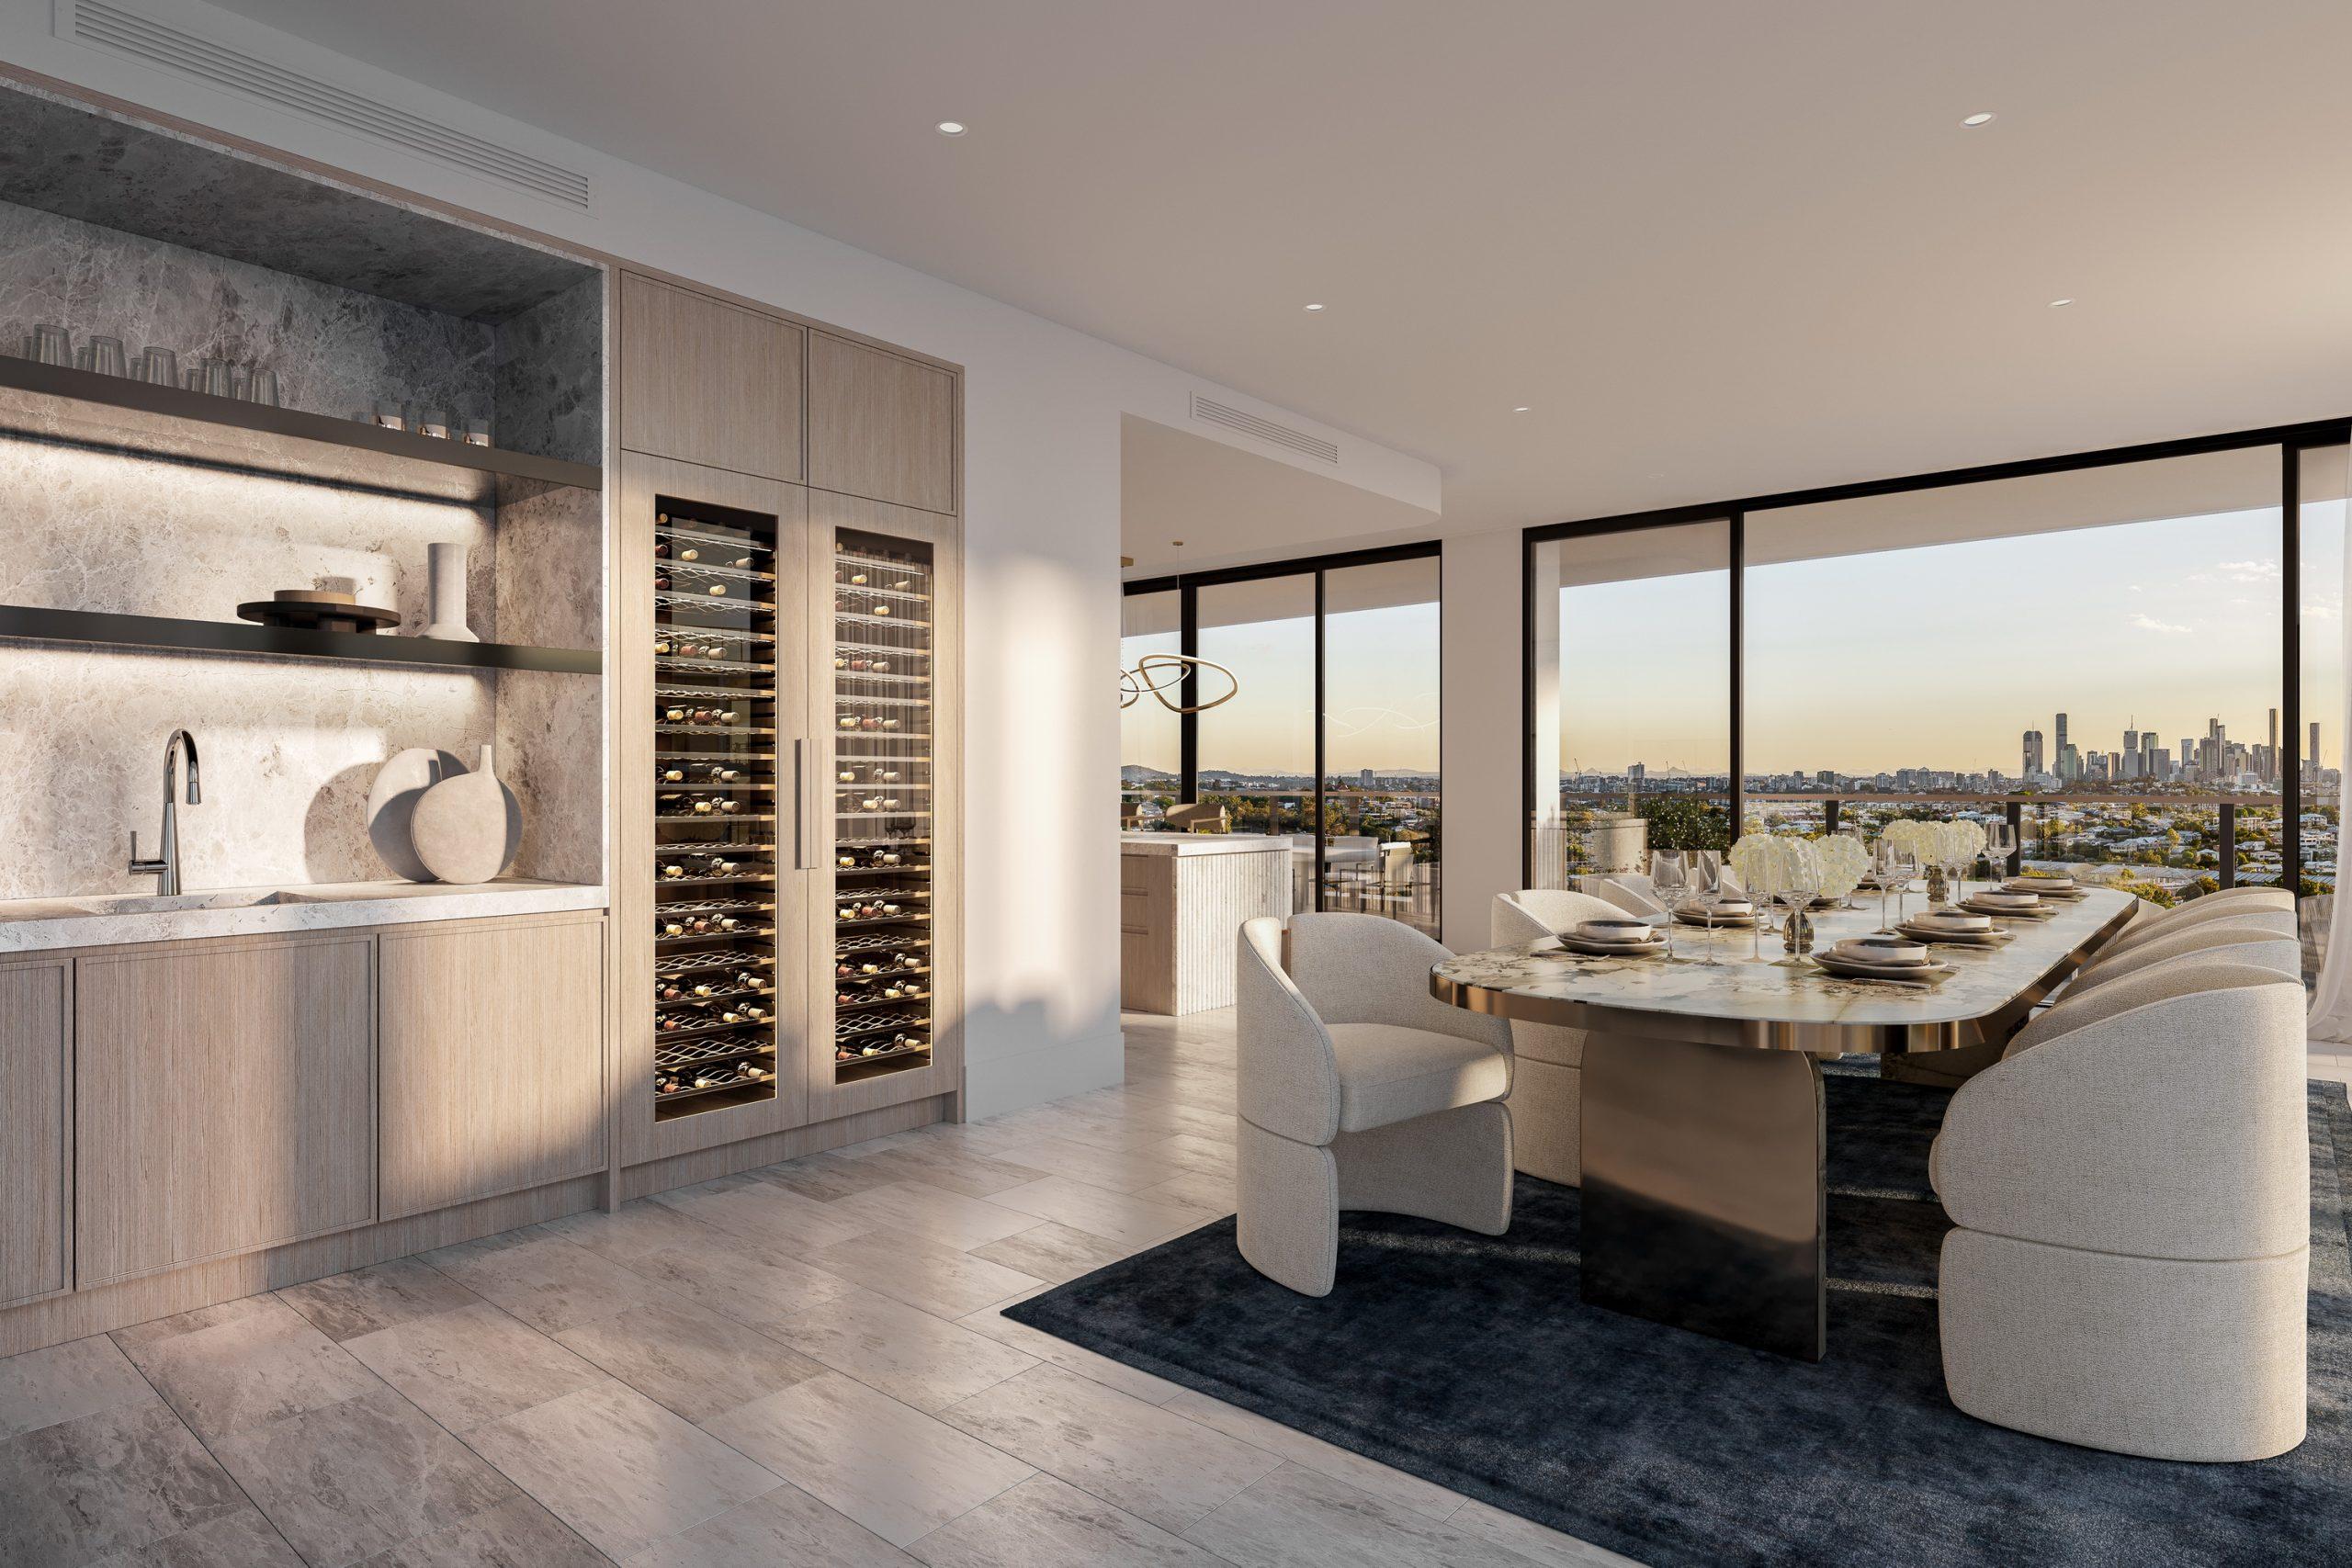 Rivello-queensland-render-3d-fkd-studio-architecture-luxury-interior-dining-room